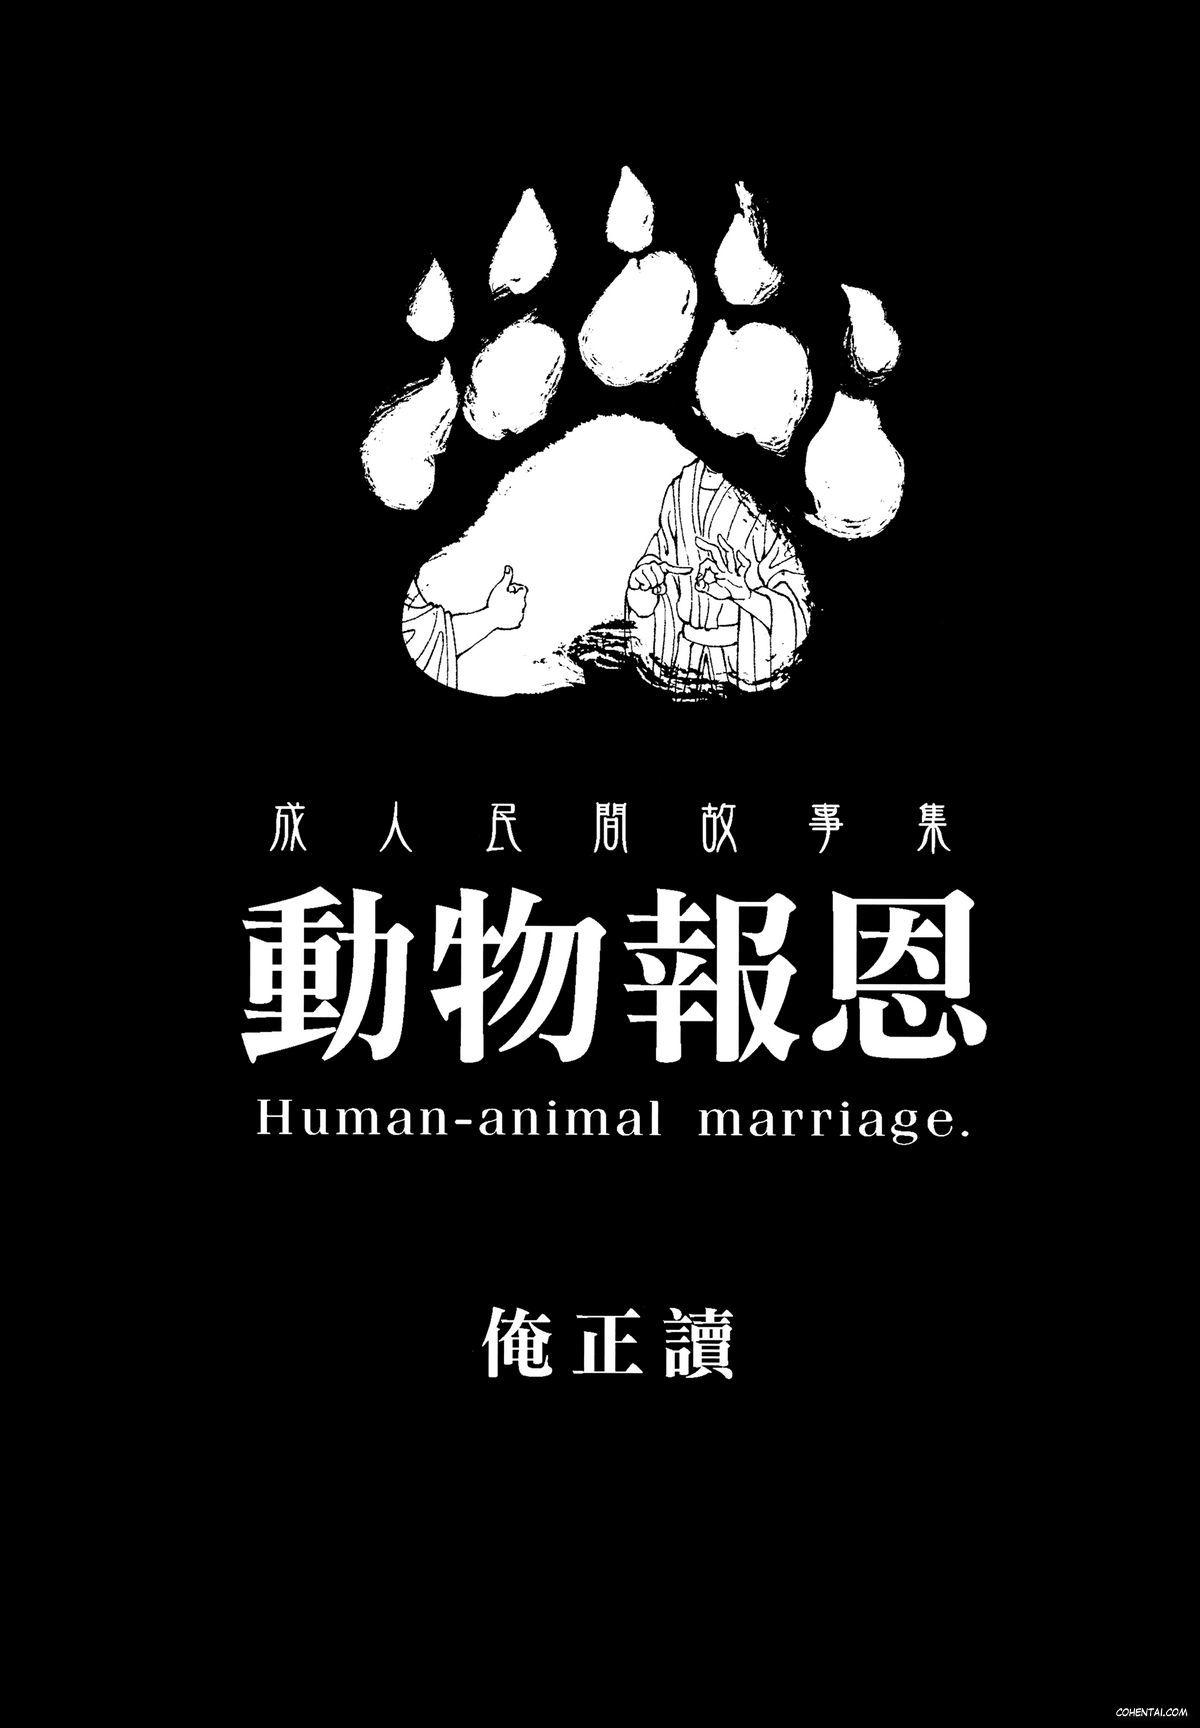 Human-animal marriage